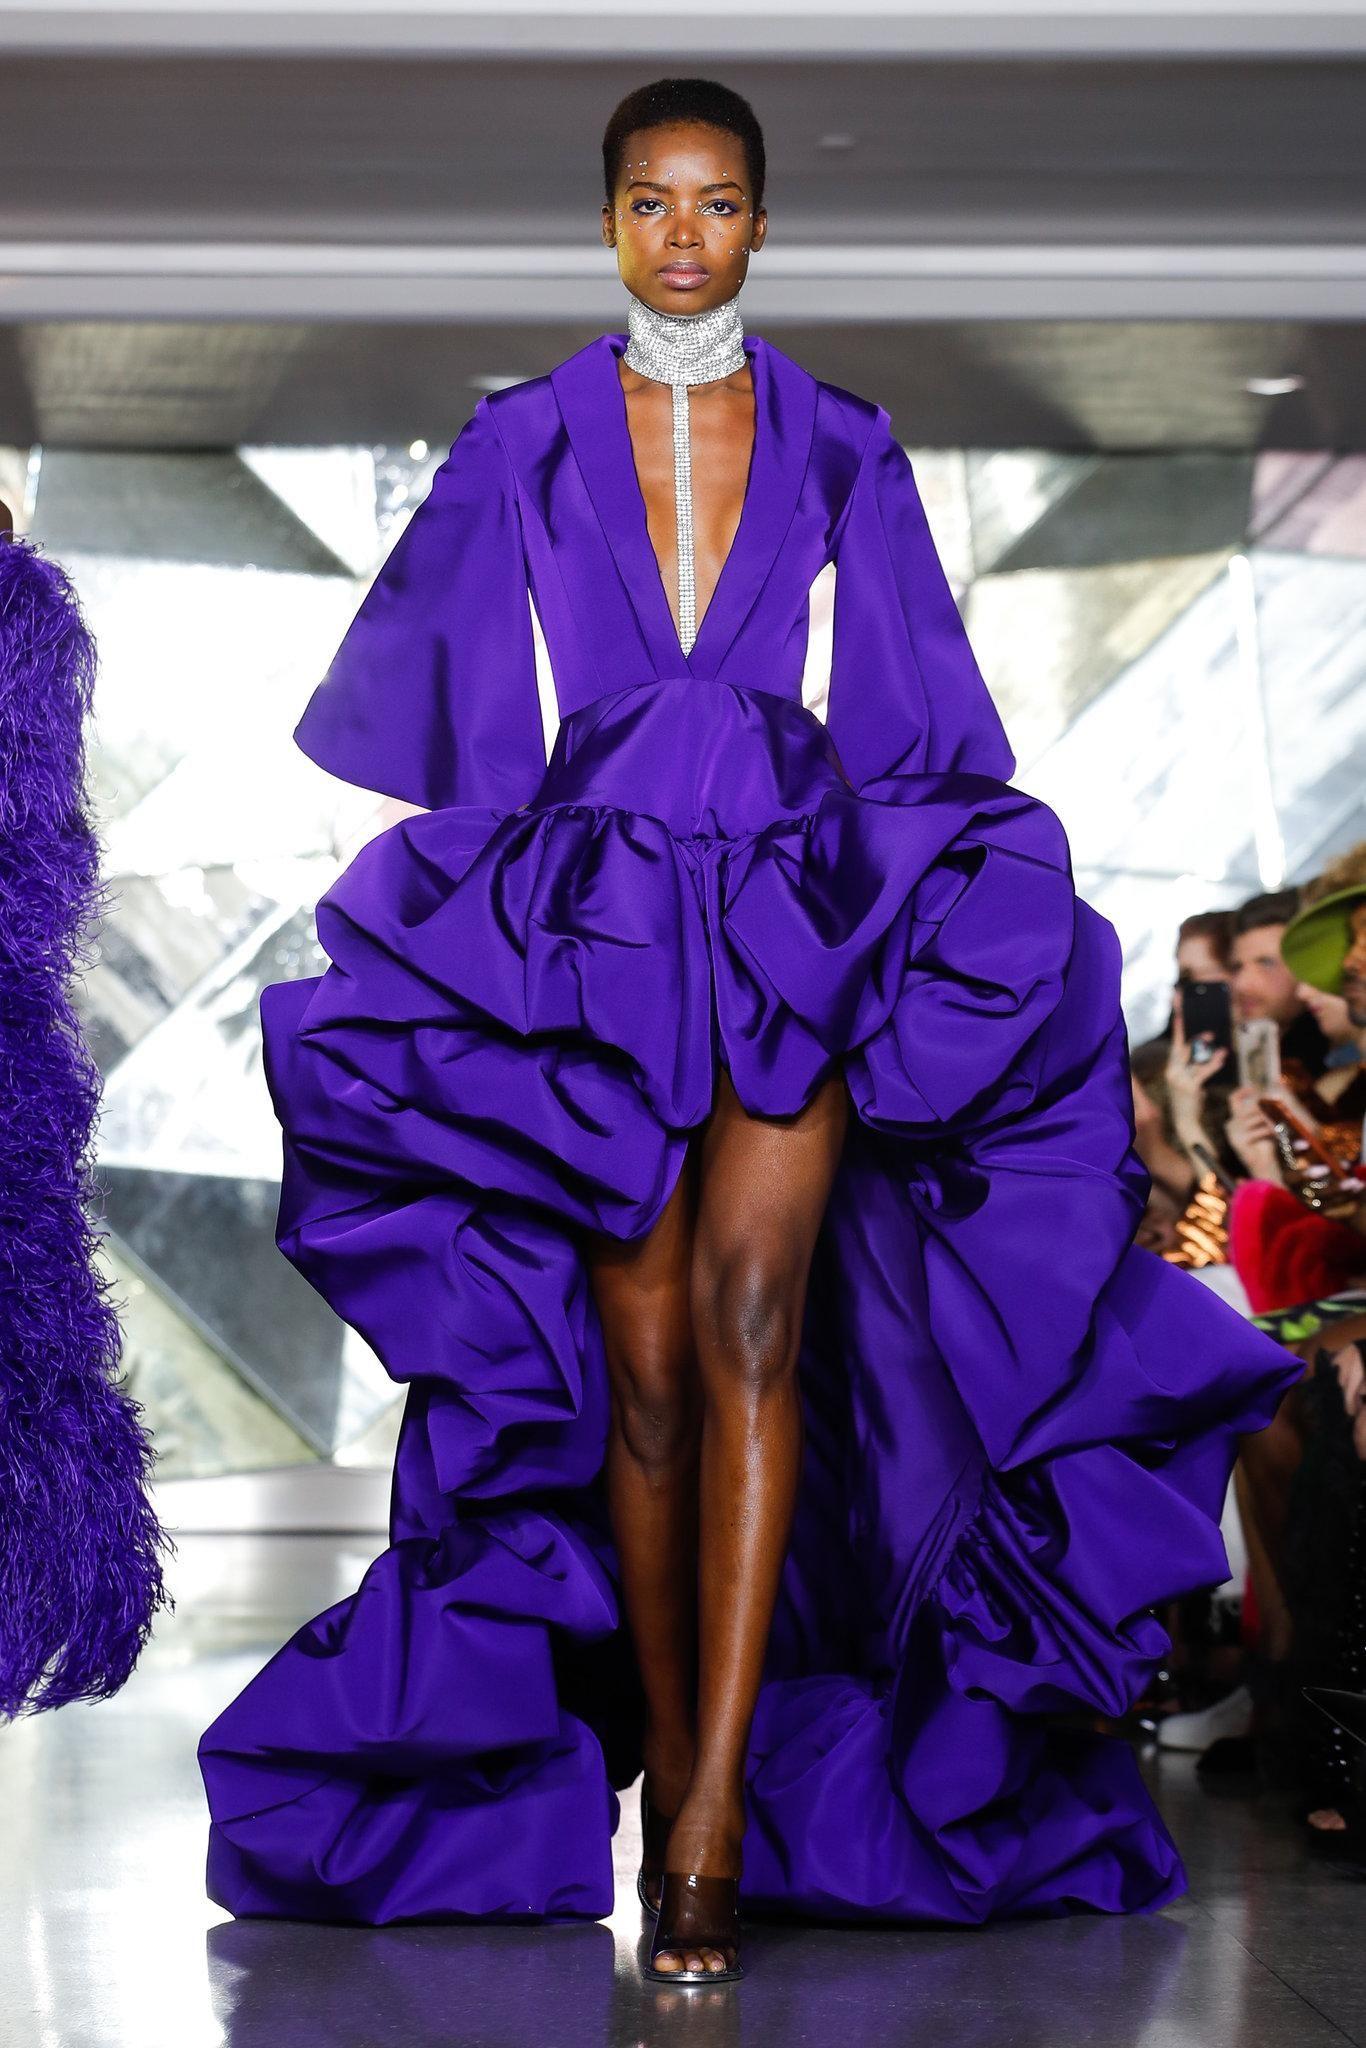 Nyc Fashion Week 2020.Christian Siriano Fall 2019 Nyc Fashion Week In 2019